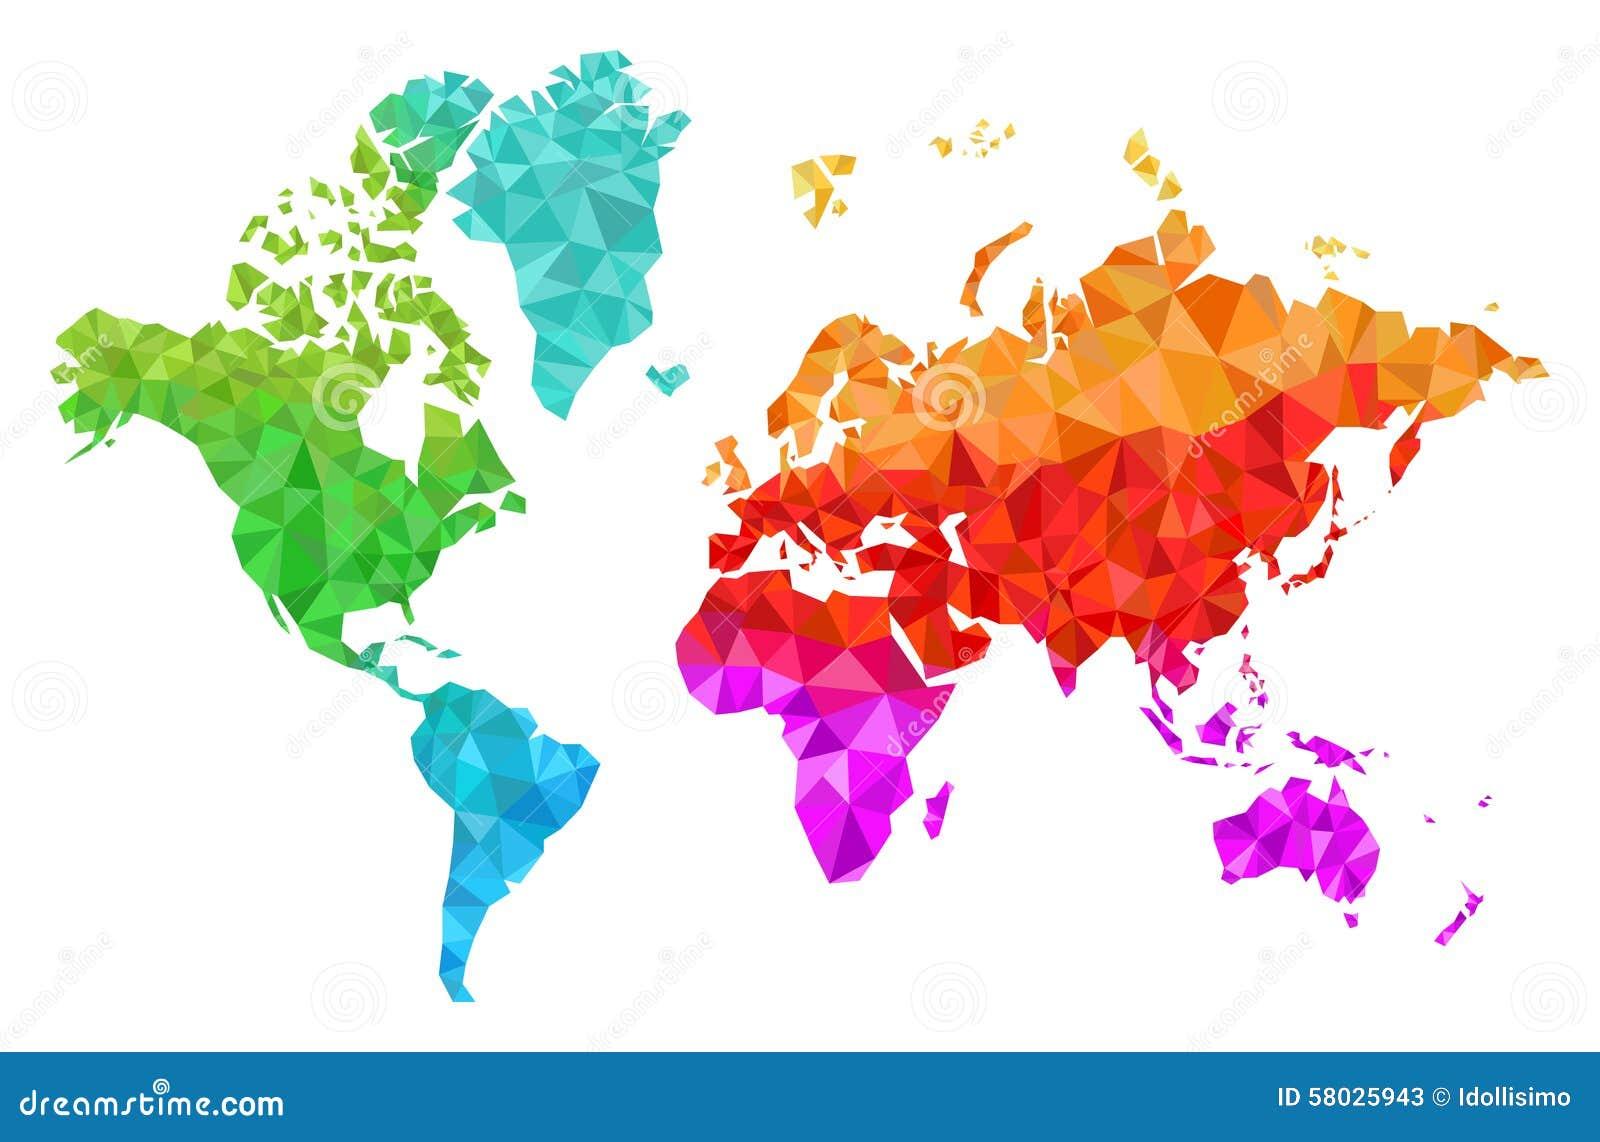 Mapa del mundo geom trico en colores ilustraci n del for Mapa del mundo decoracion